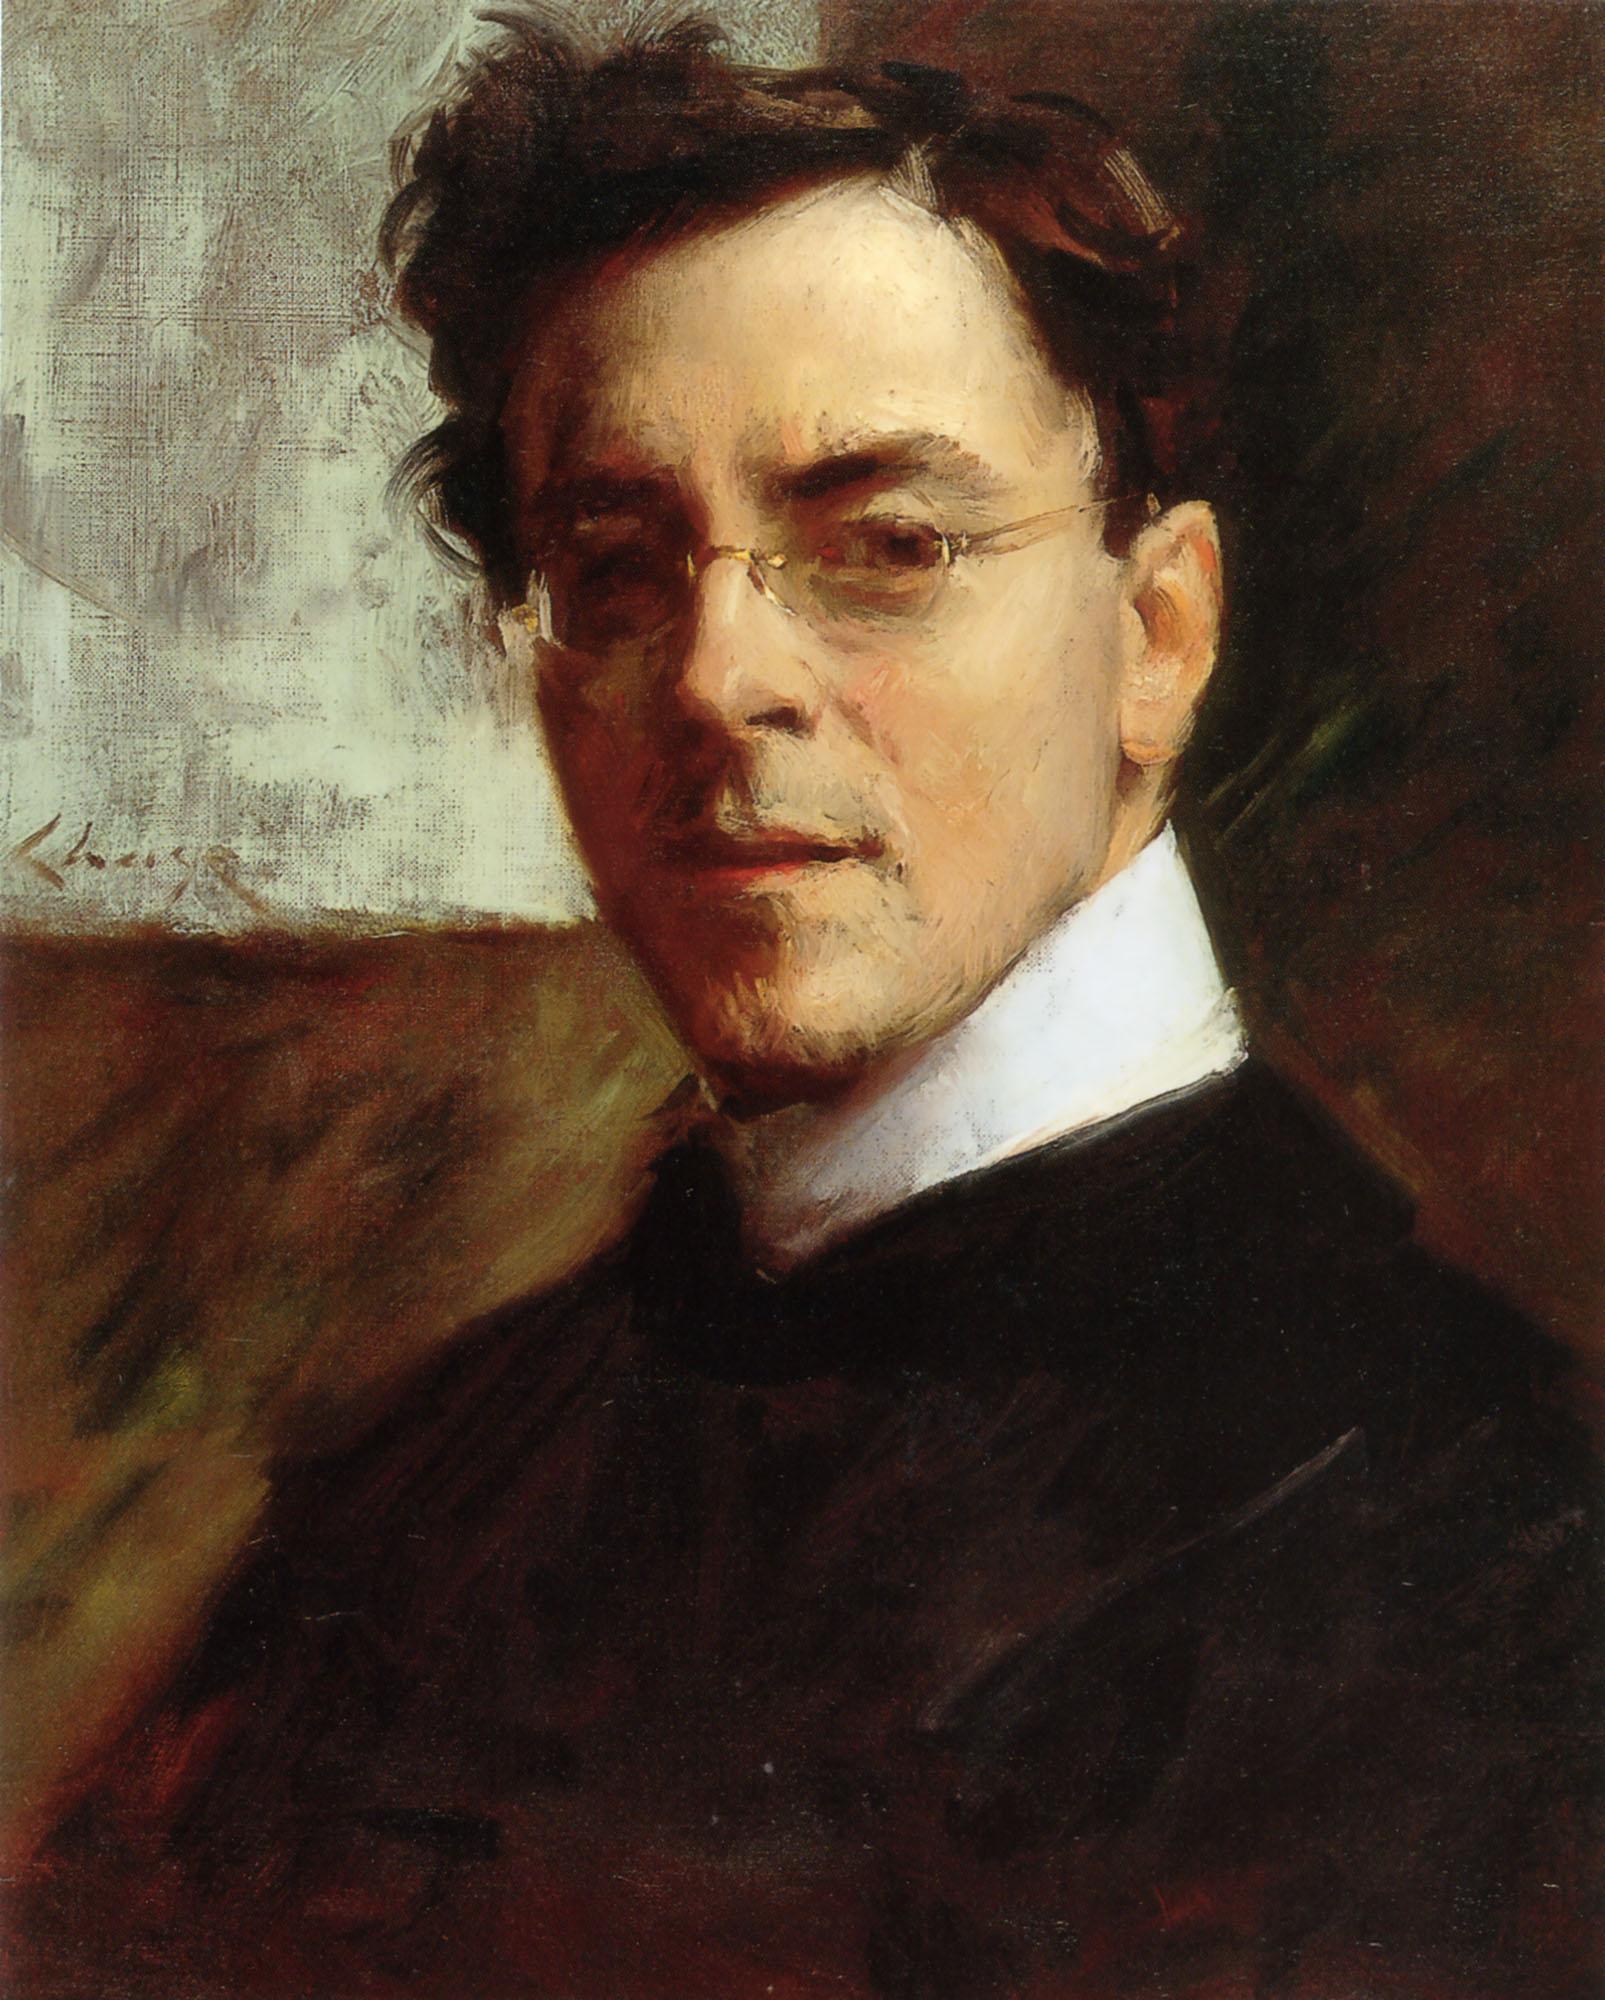 Portrait of Louis Betts - William Merritt Chase - WikiArt.org